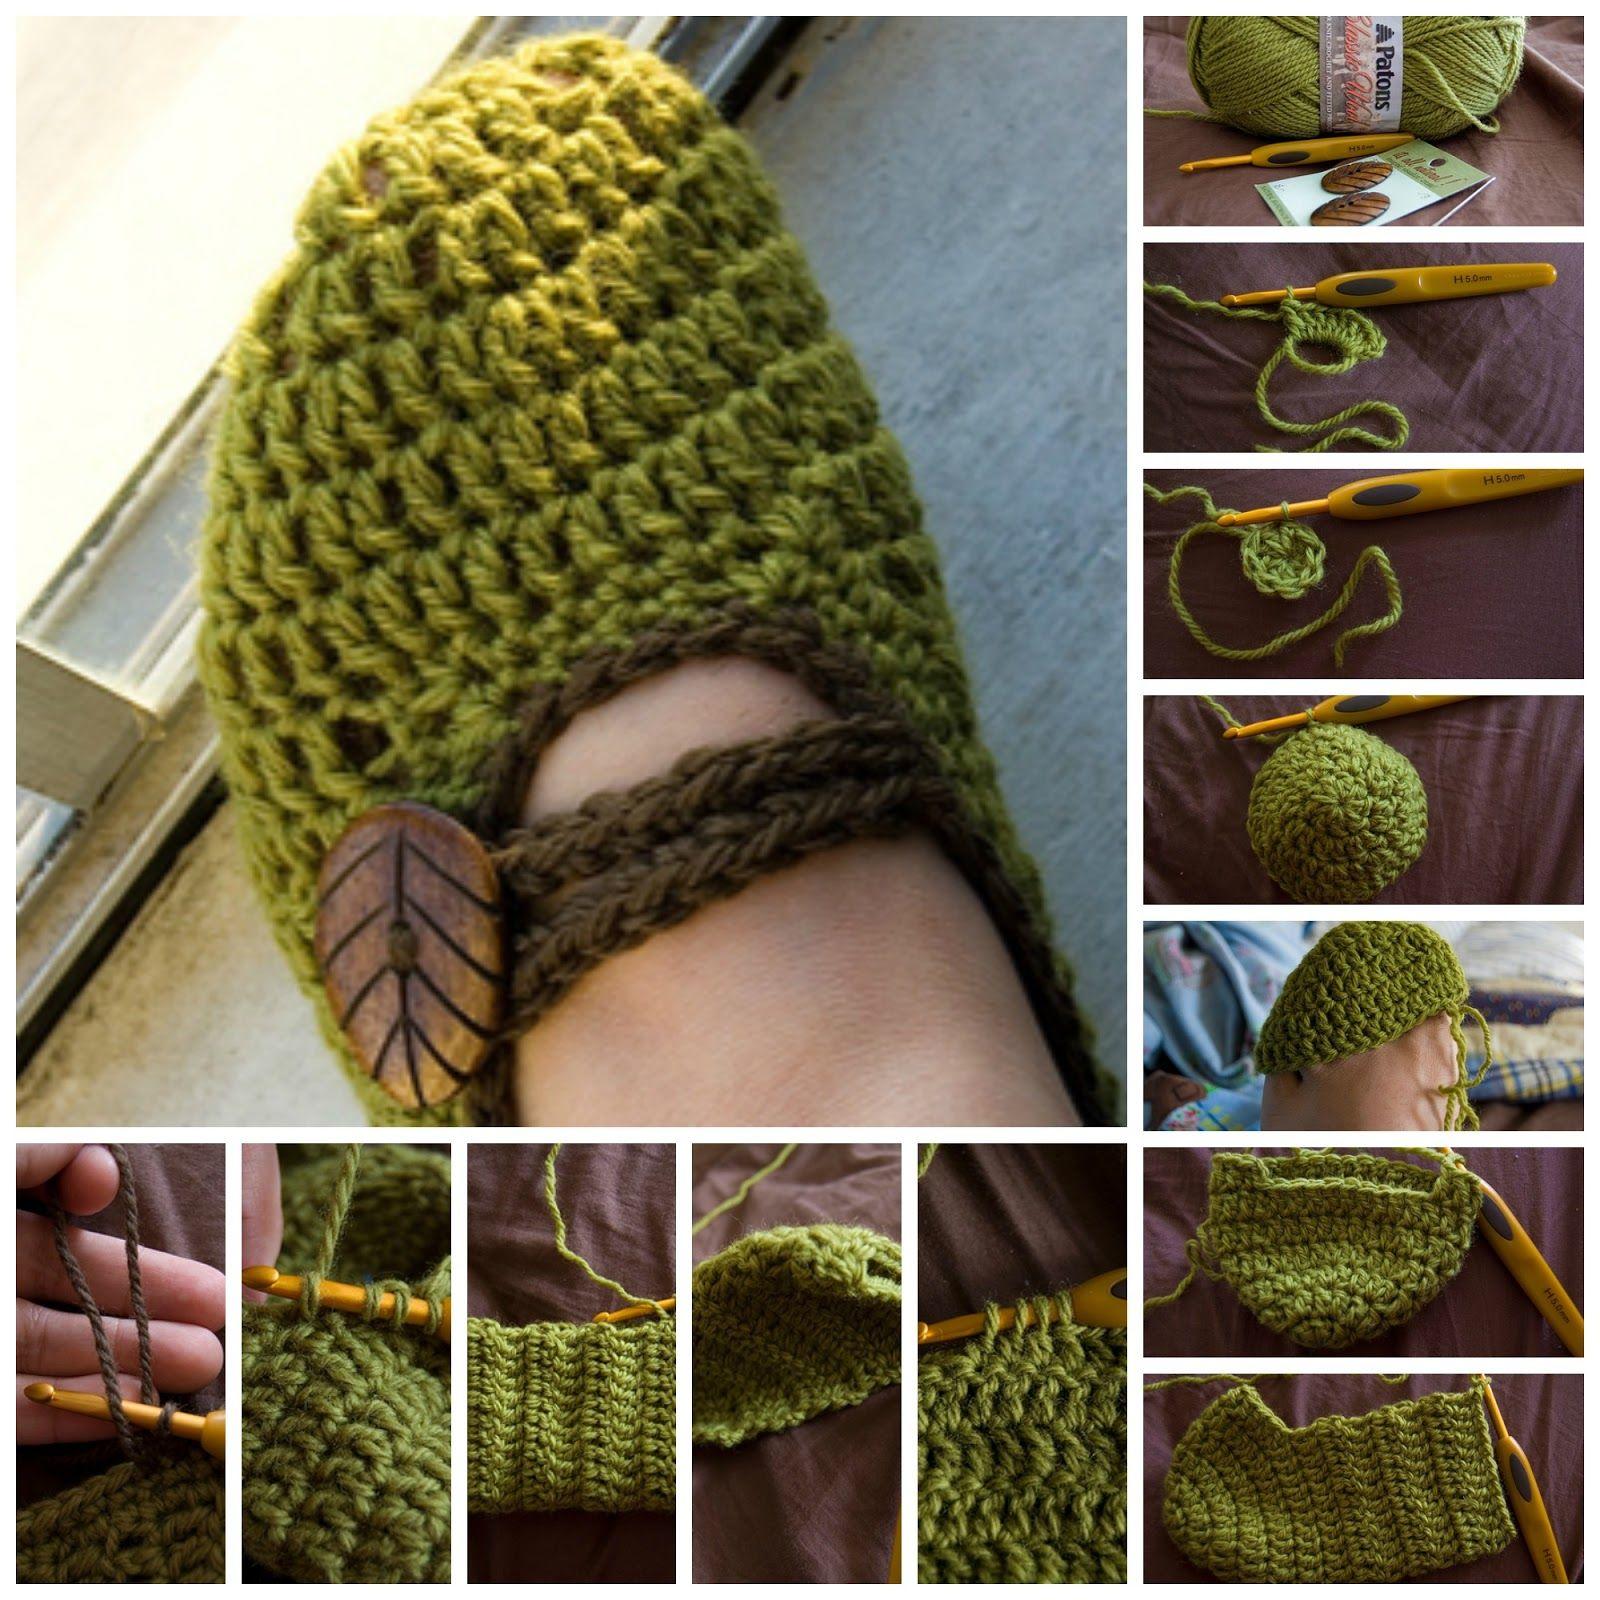 Fantástico Zapatilla Patrones De Crochet Libre Modelo - Manta de ...